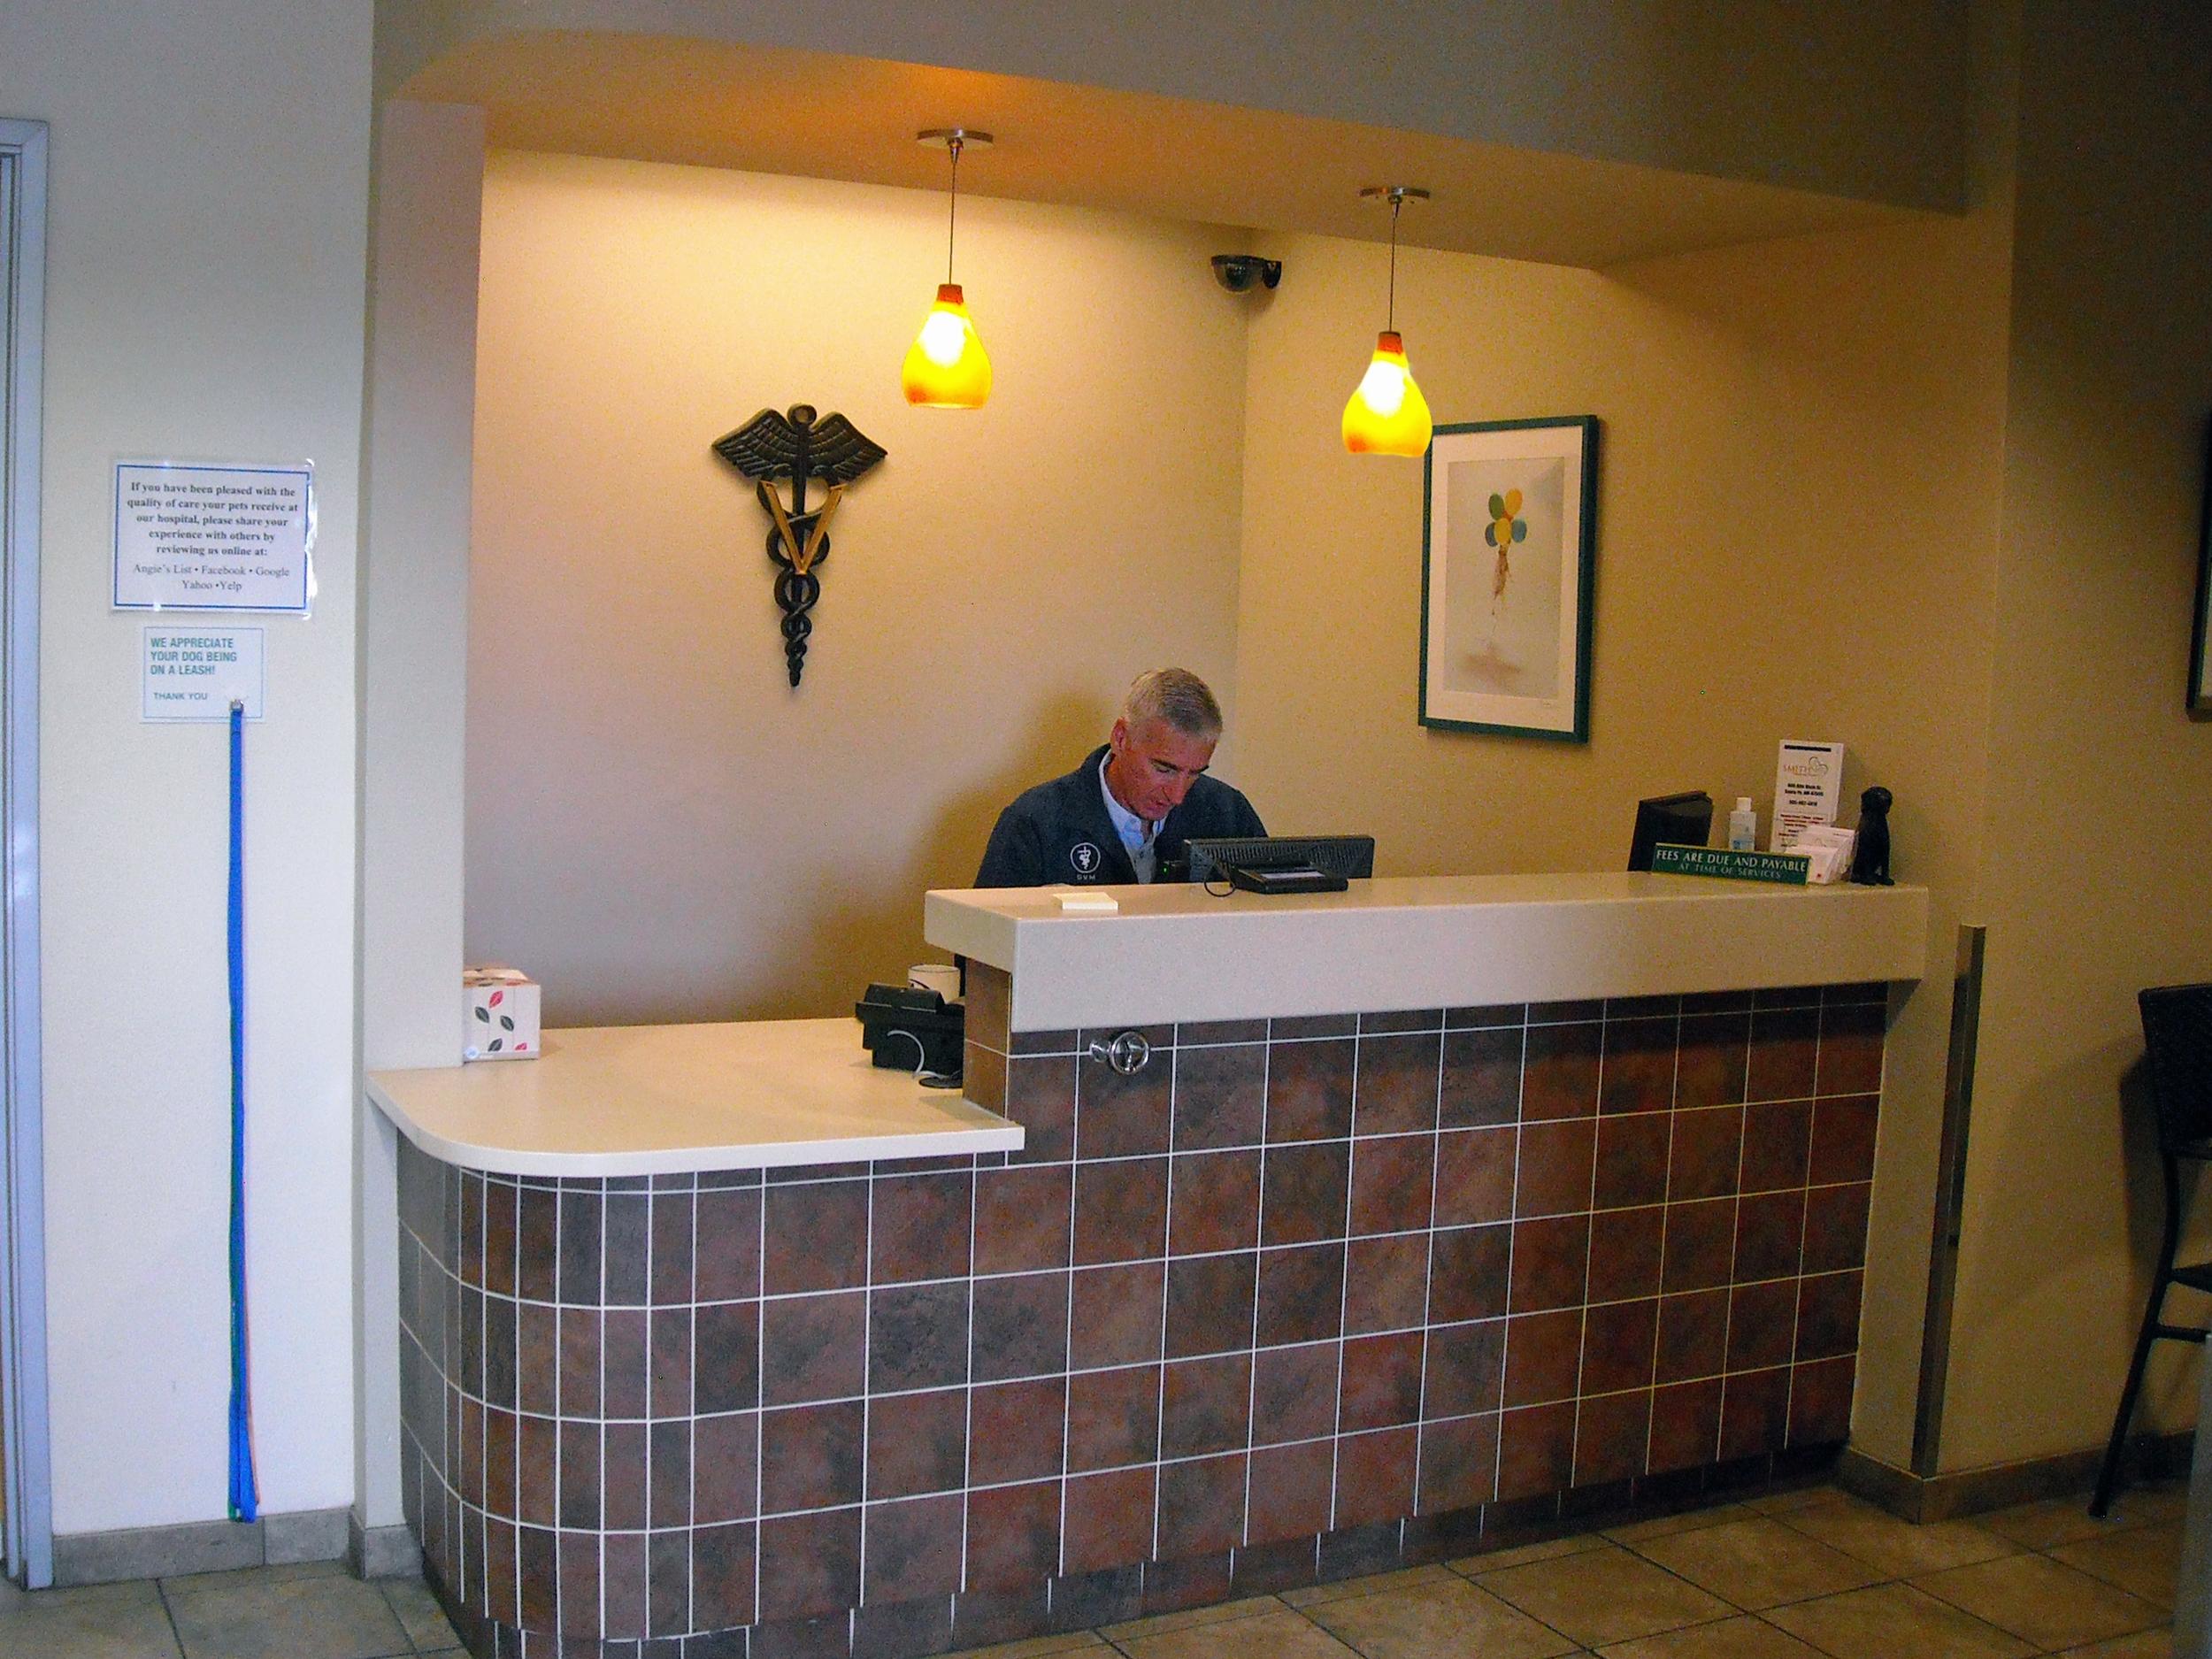 Urgent care reception desk